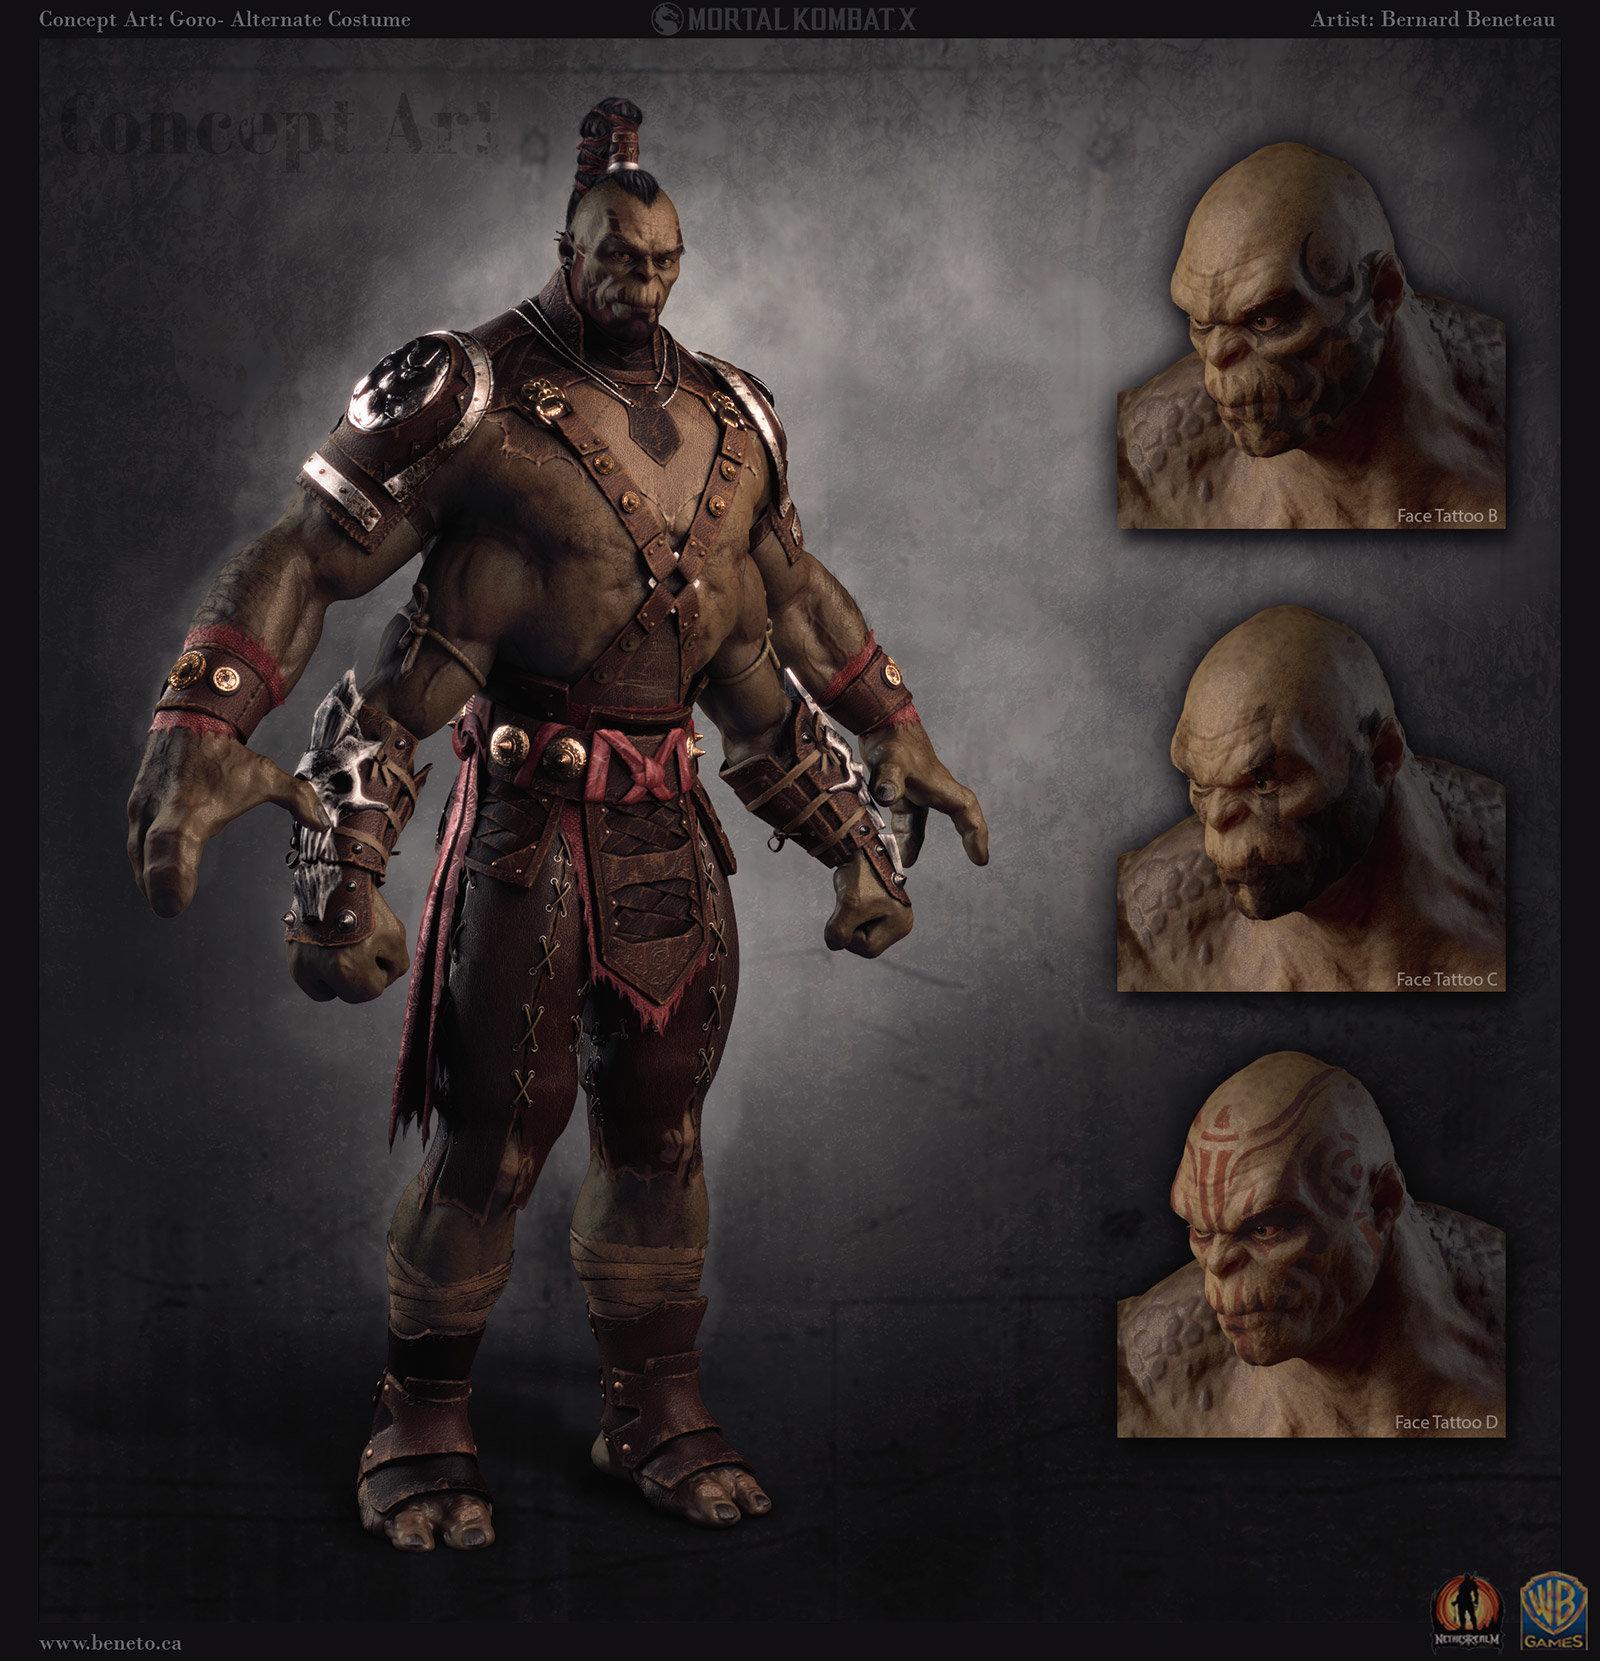 ArtStation - Concept Art: Mortal Kombat X- Goro Alt, Bernard